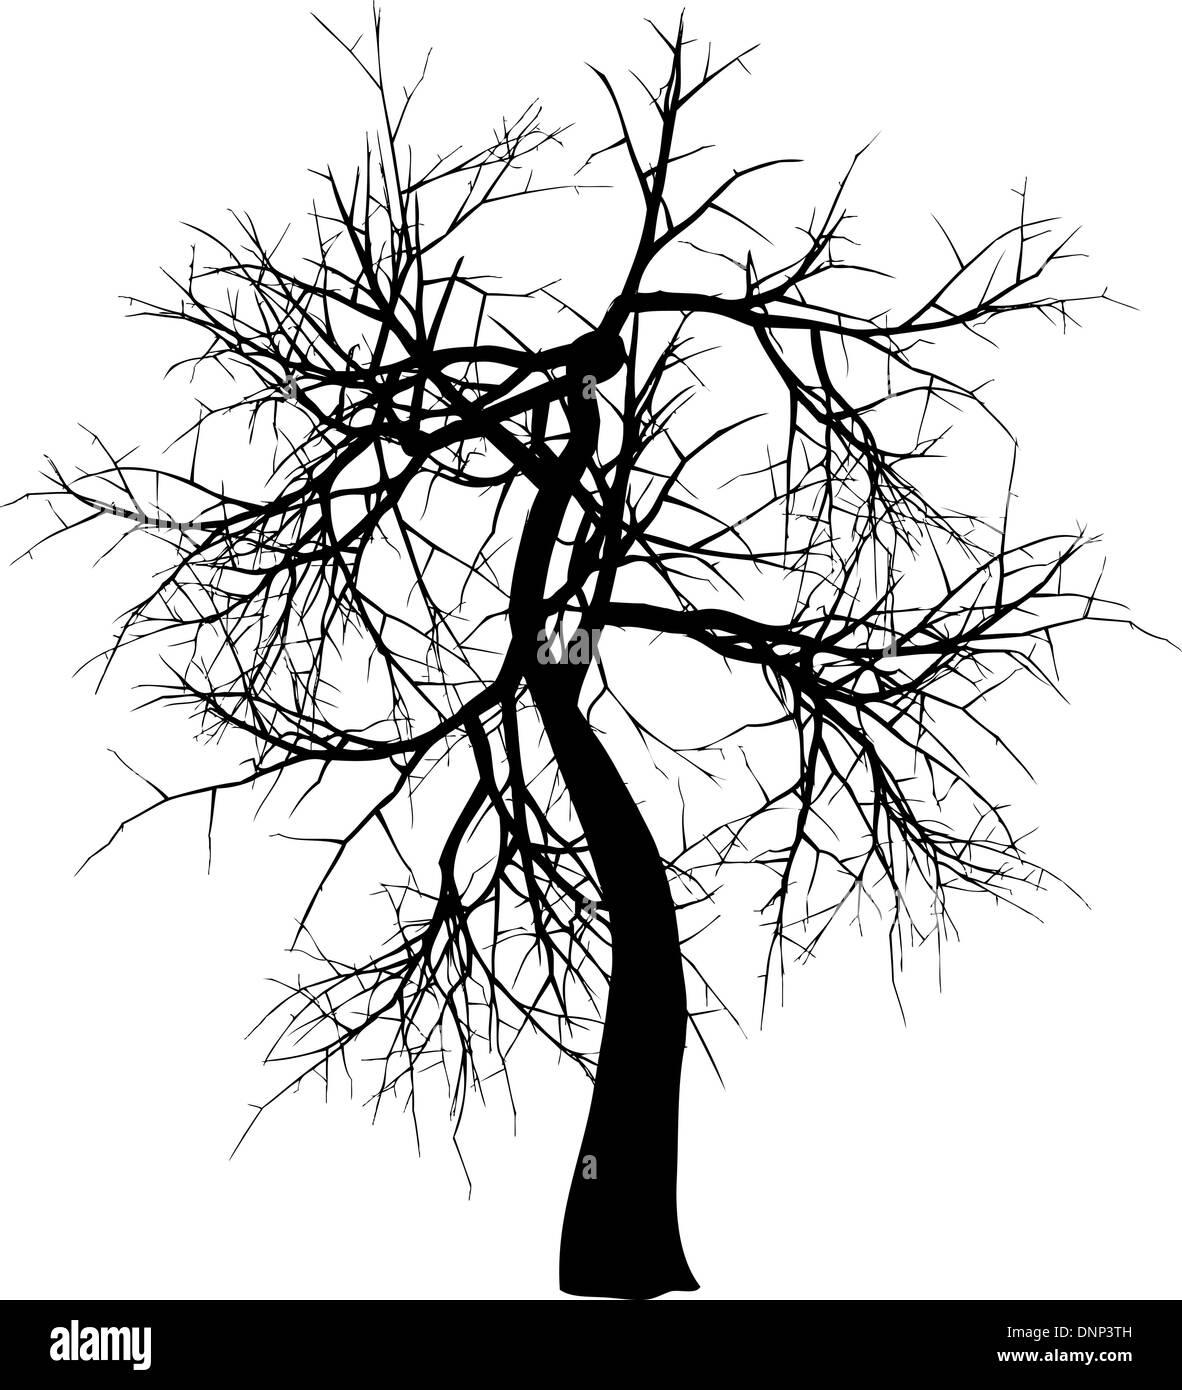 Silhouette of a winter tree Stock-Vektorgrafik